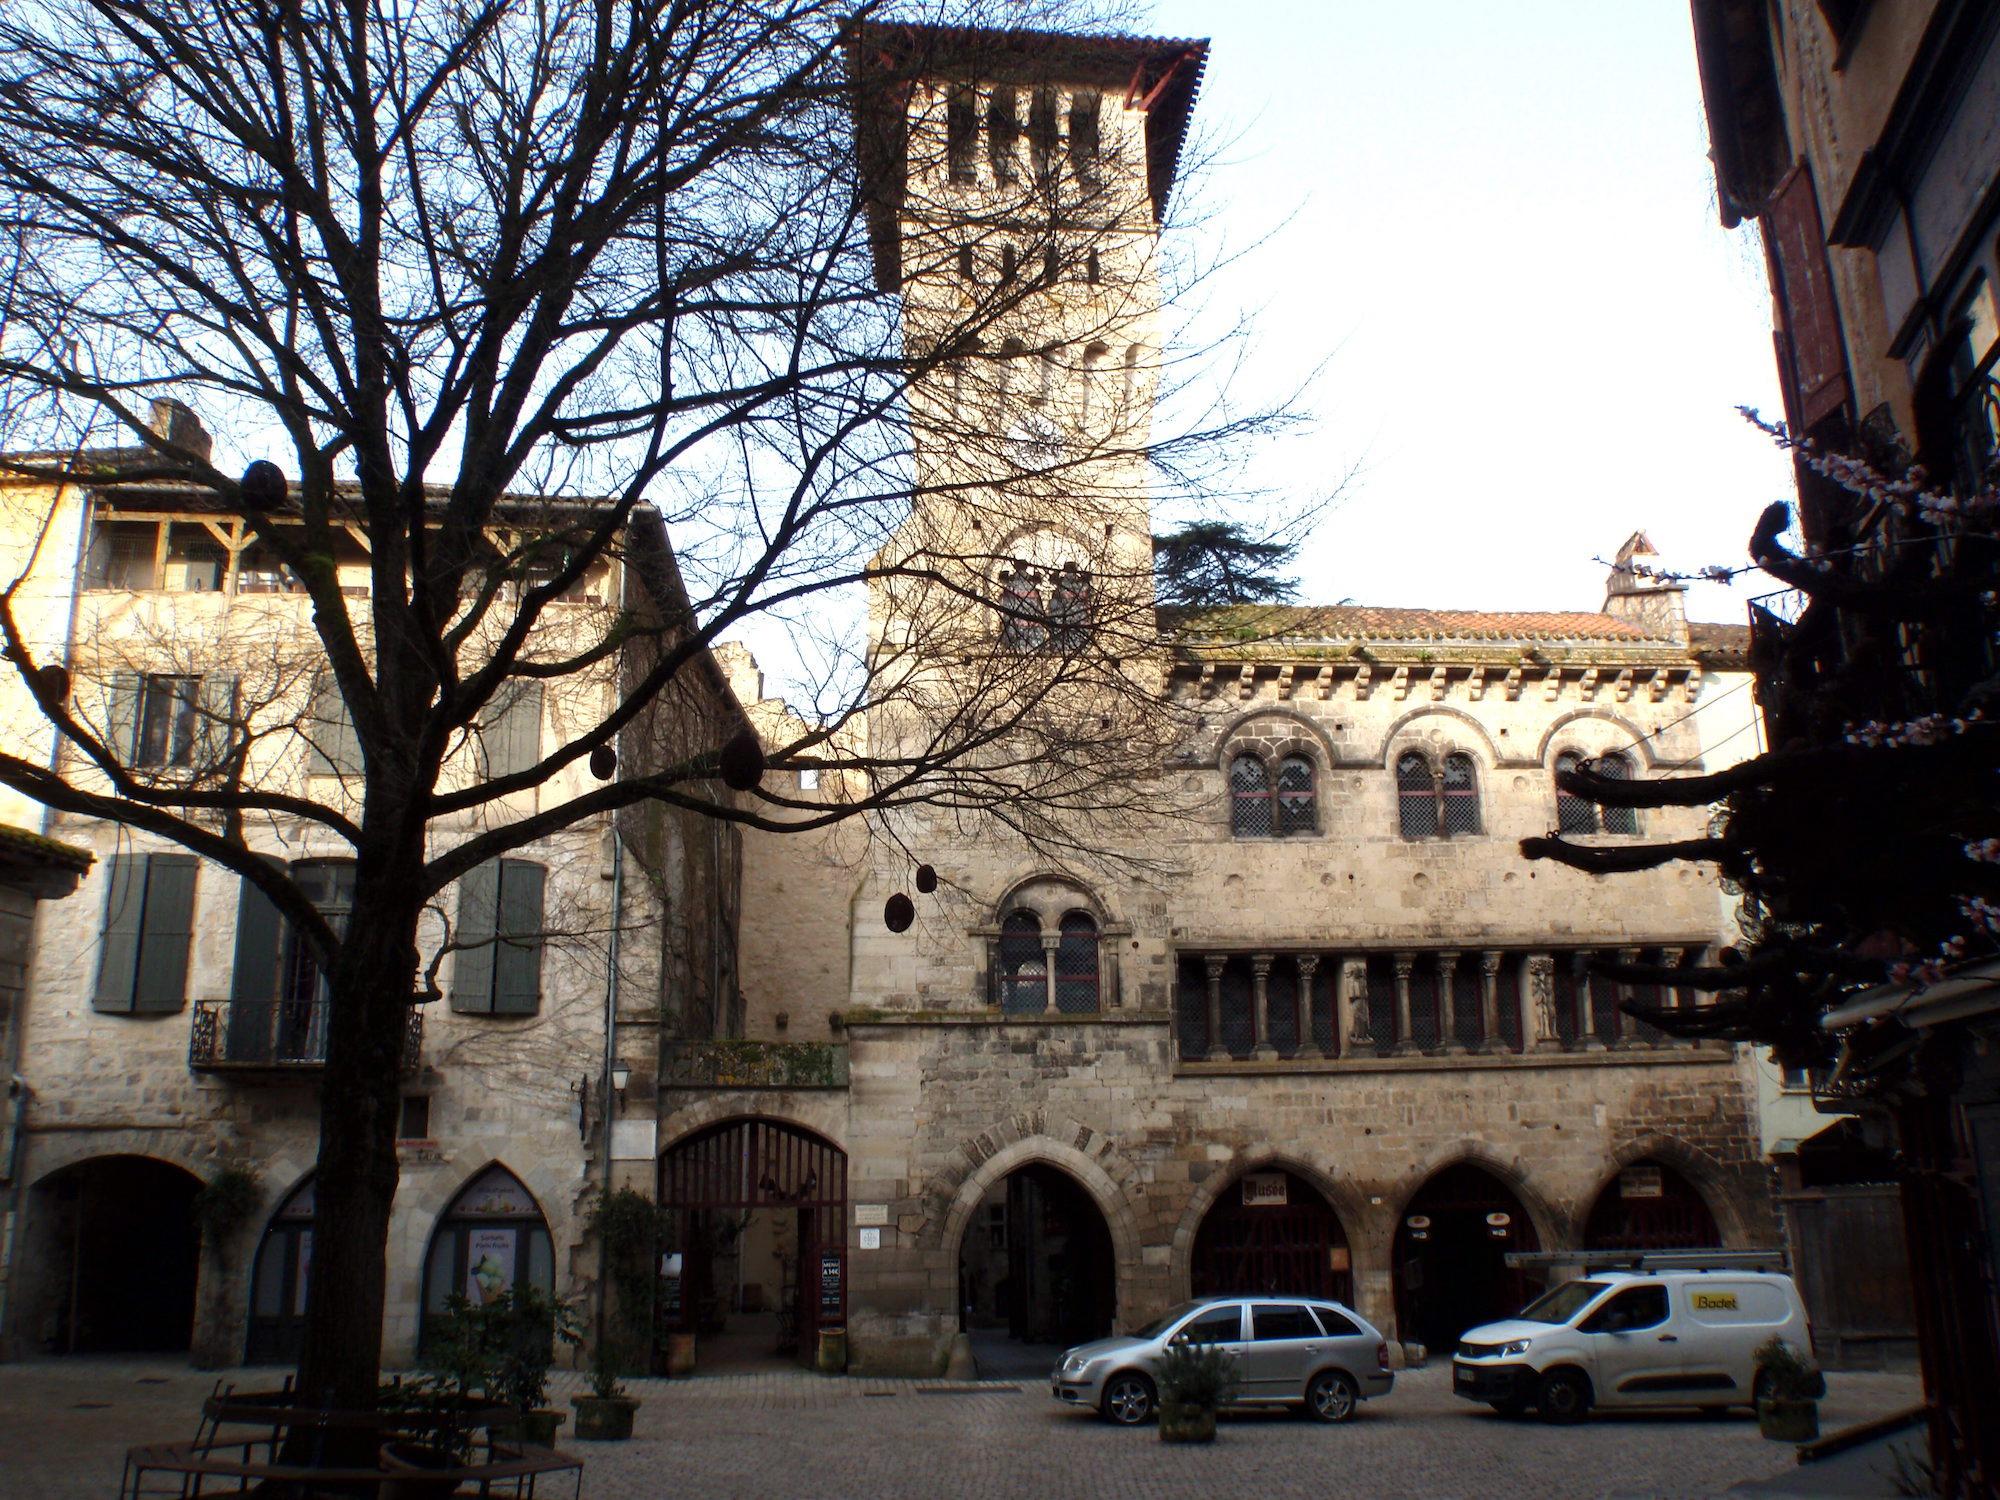 St-Antonin-Le Beffroi